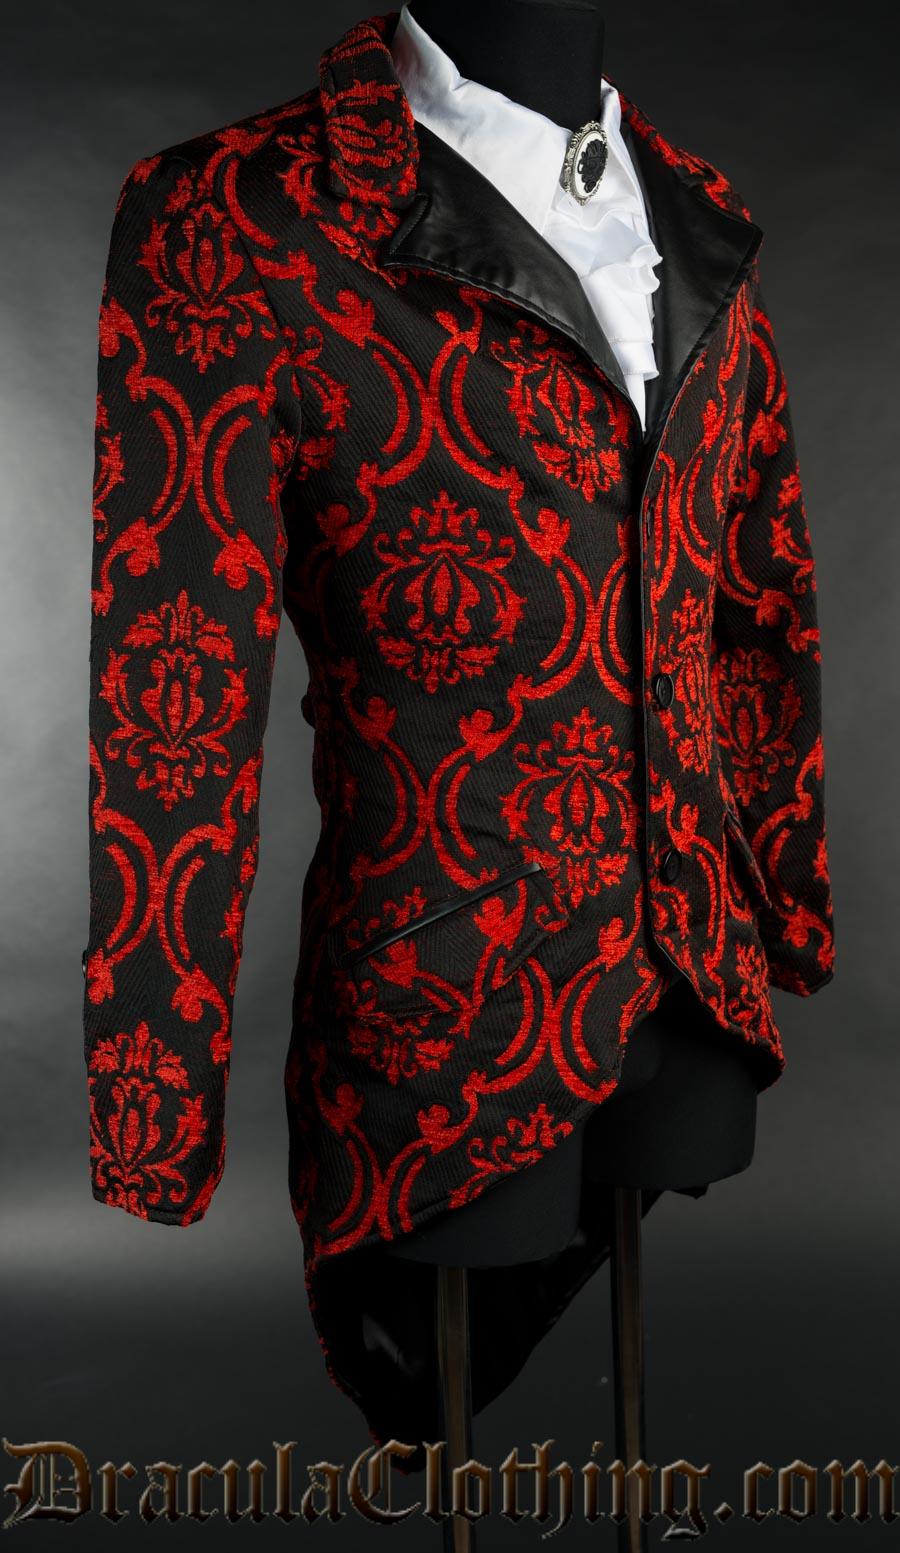 Red Brocade Tailcoat